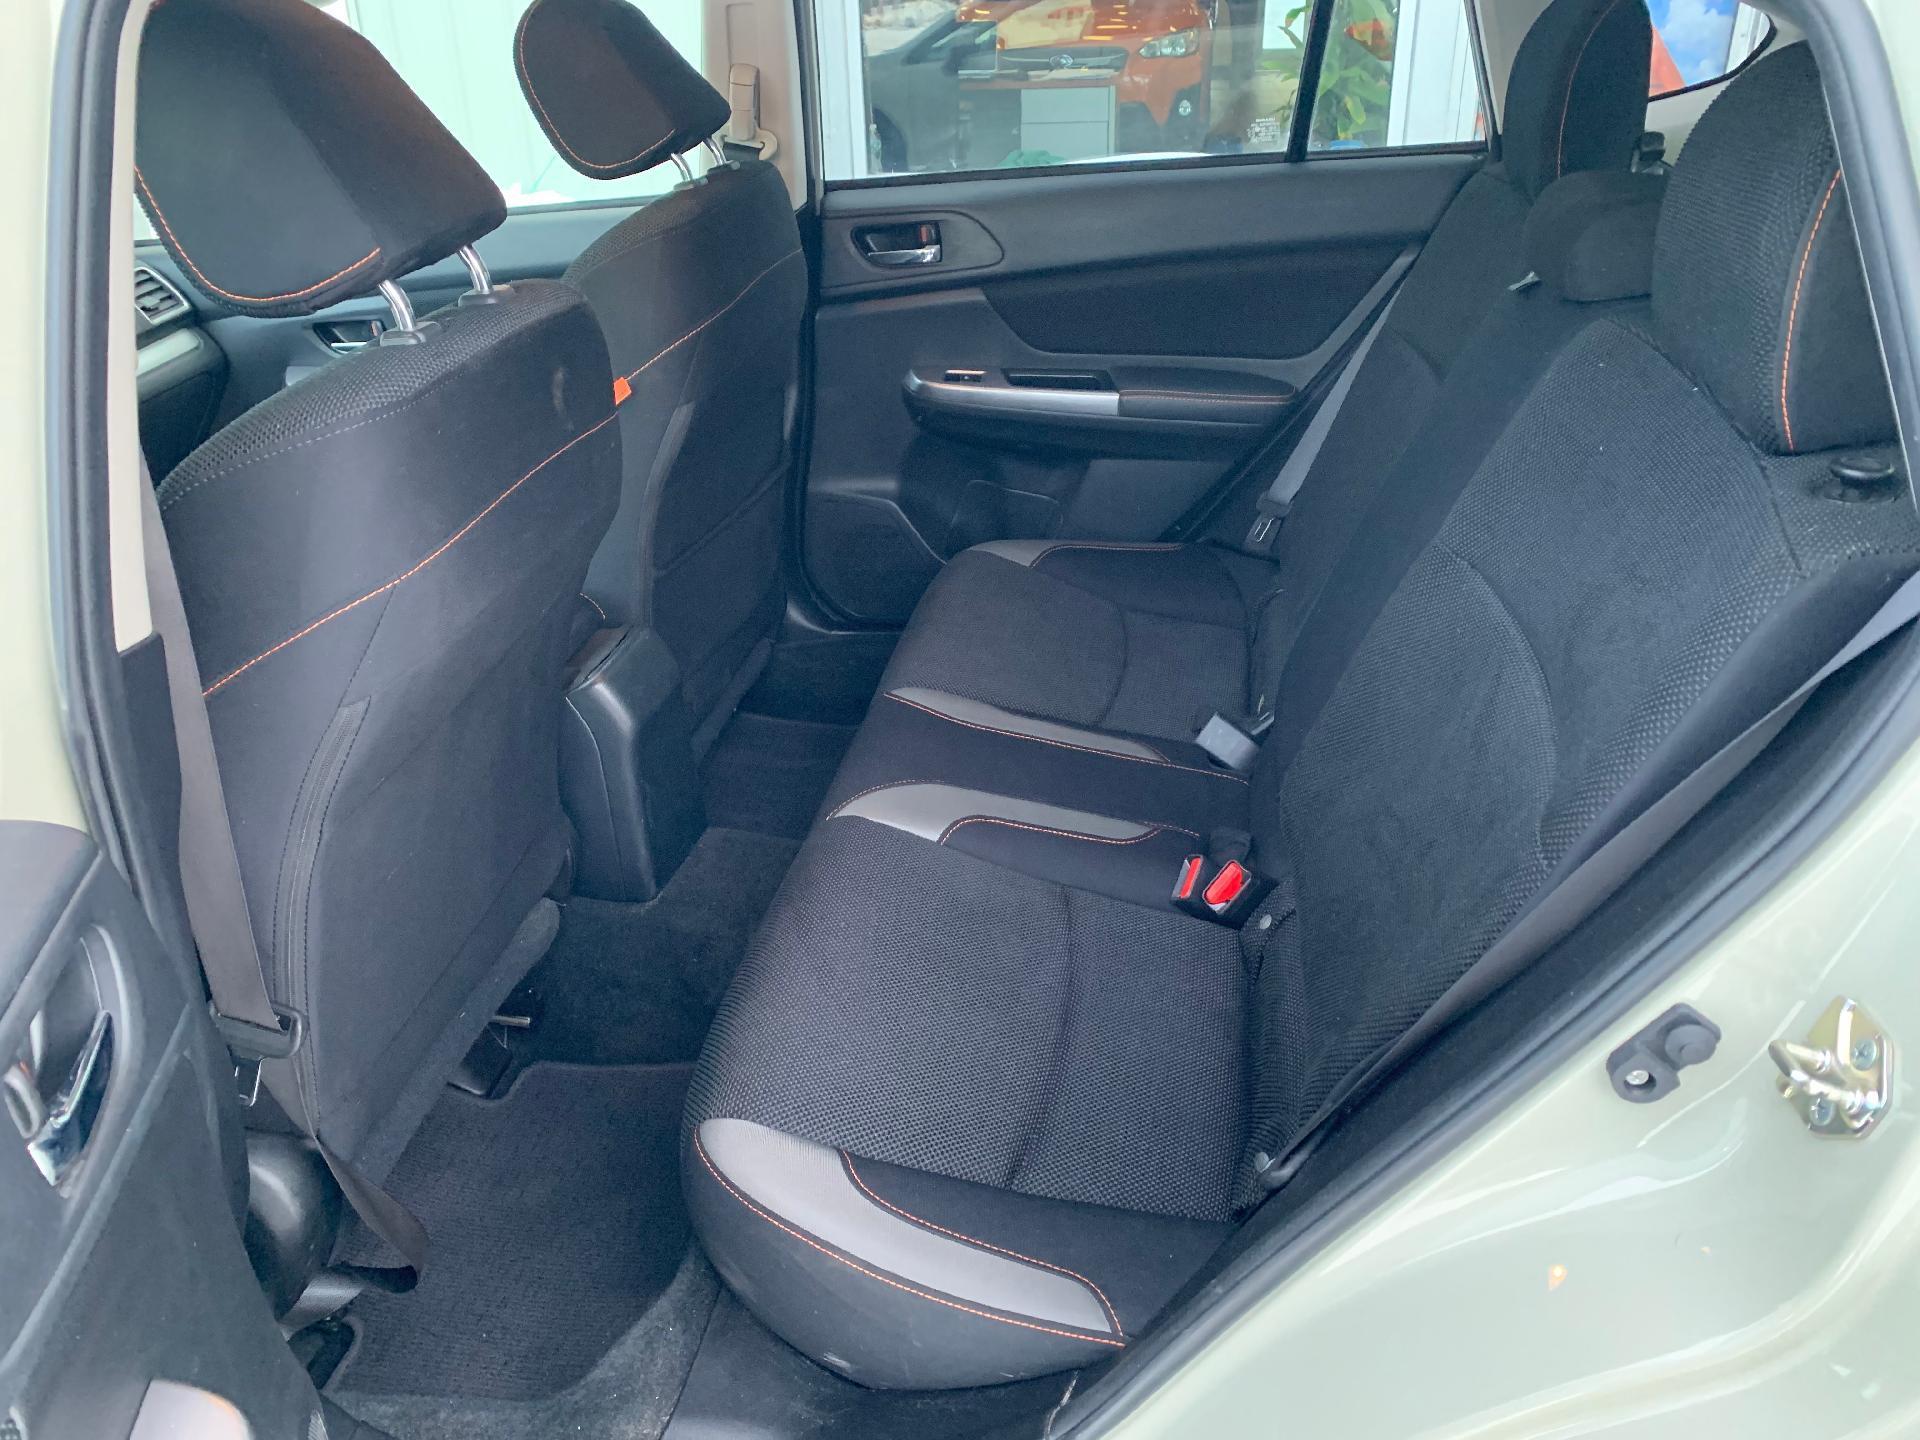 2017 Used Subaru Crosstrek For Sale Conway NH   VIN JF2GPABC7H8216546